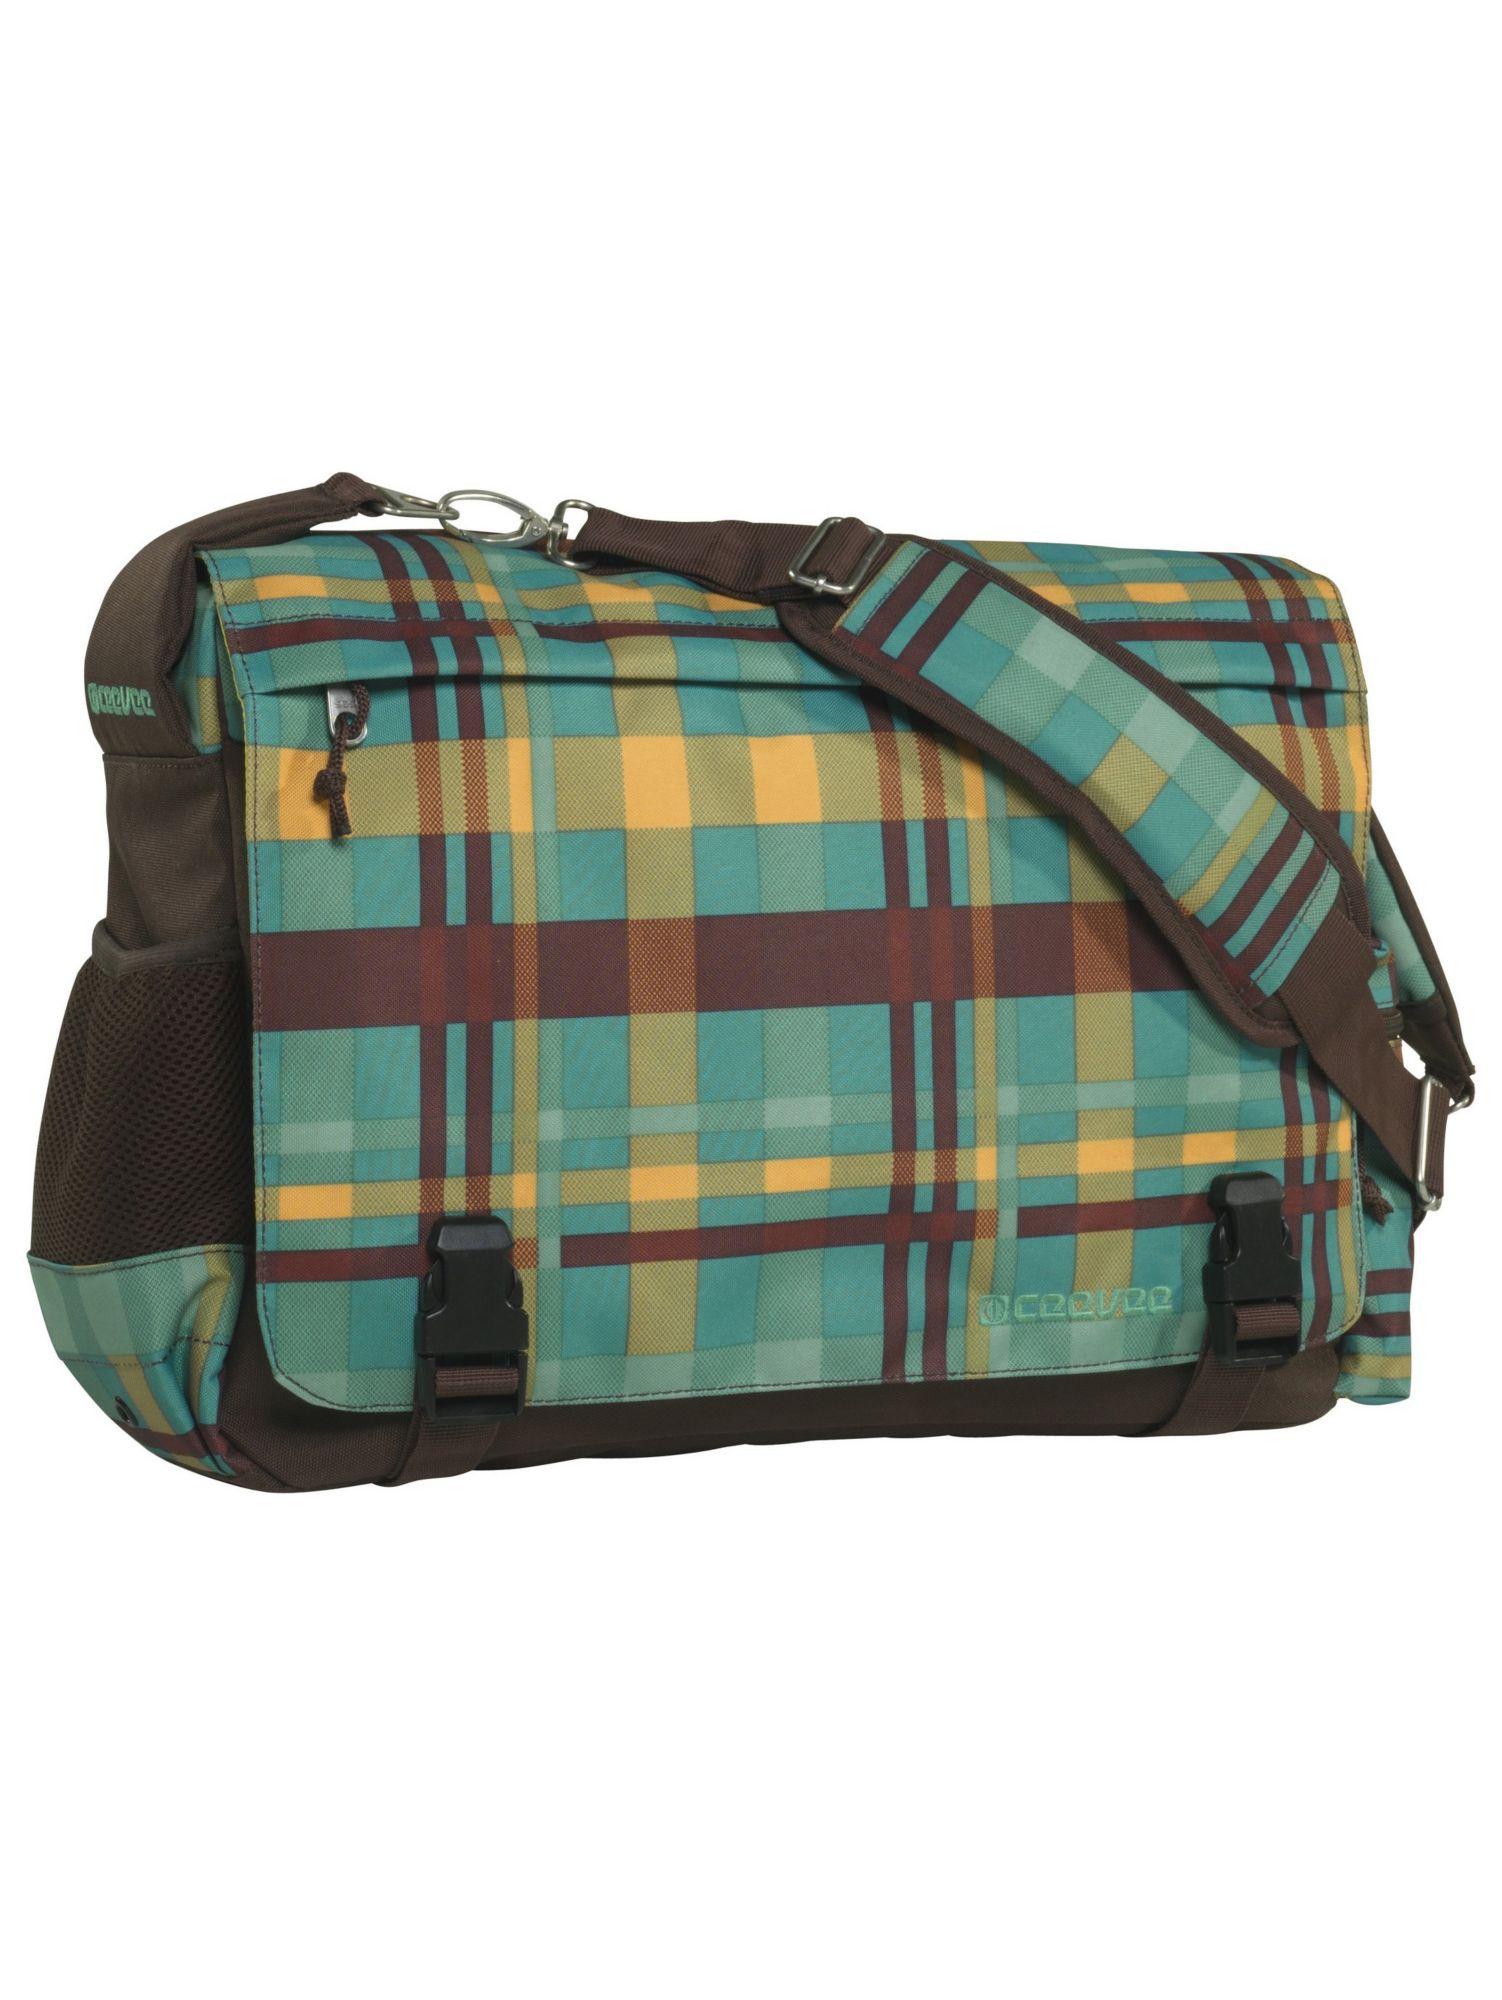 CEEVEE® ceevee® Messenger Bag, »Manchester caro petrol«